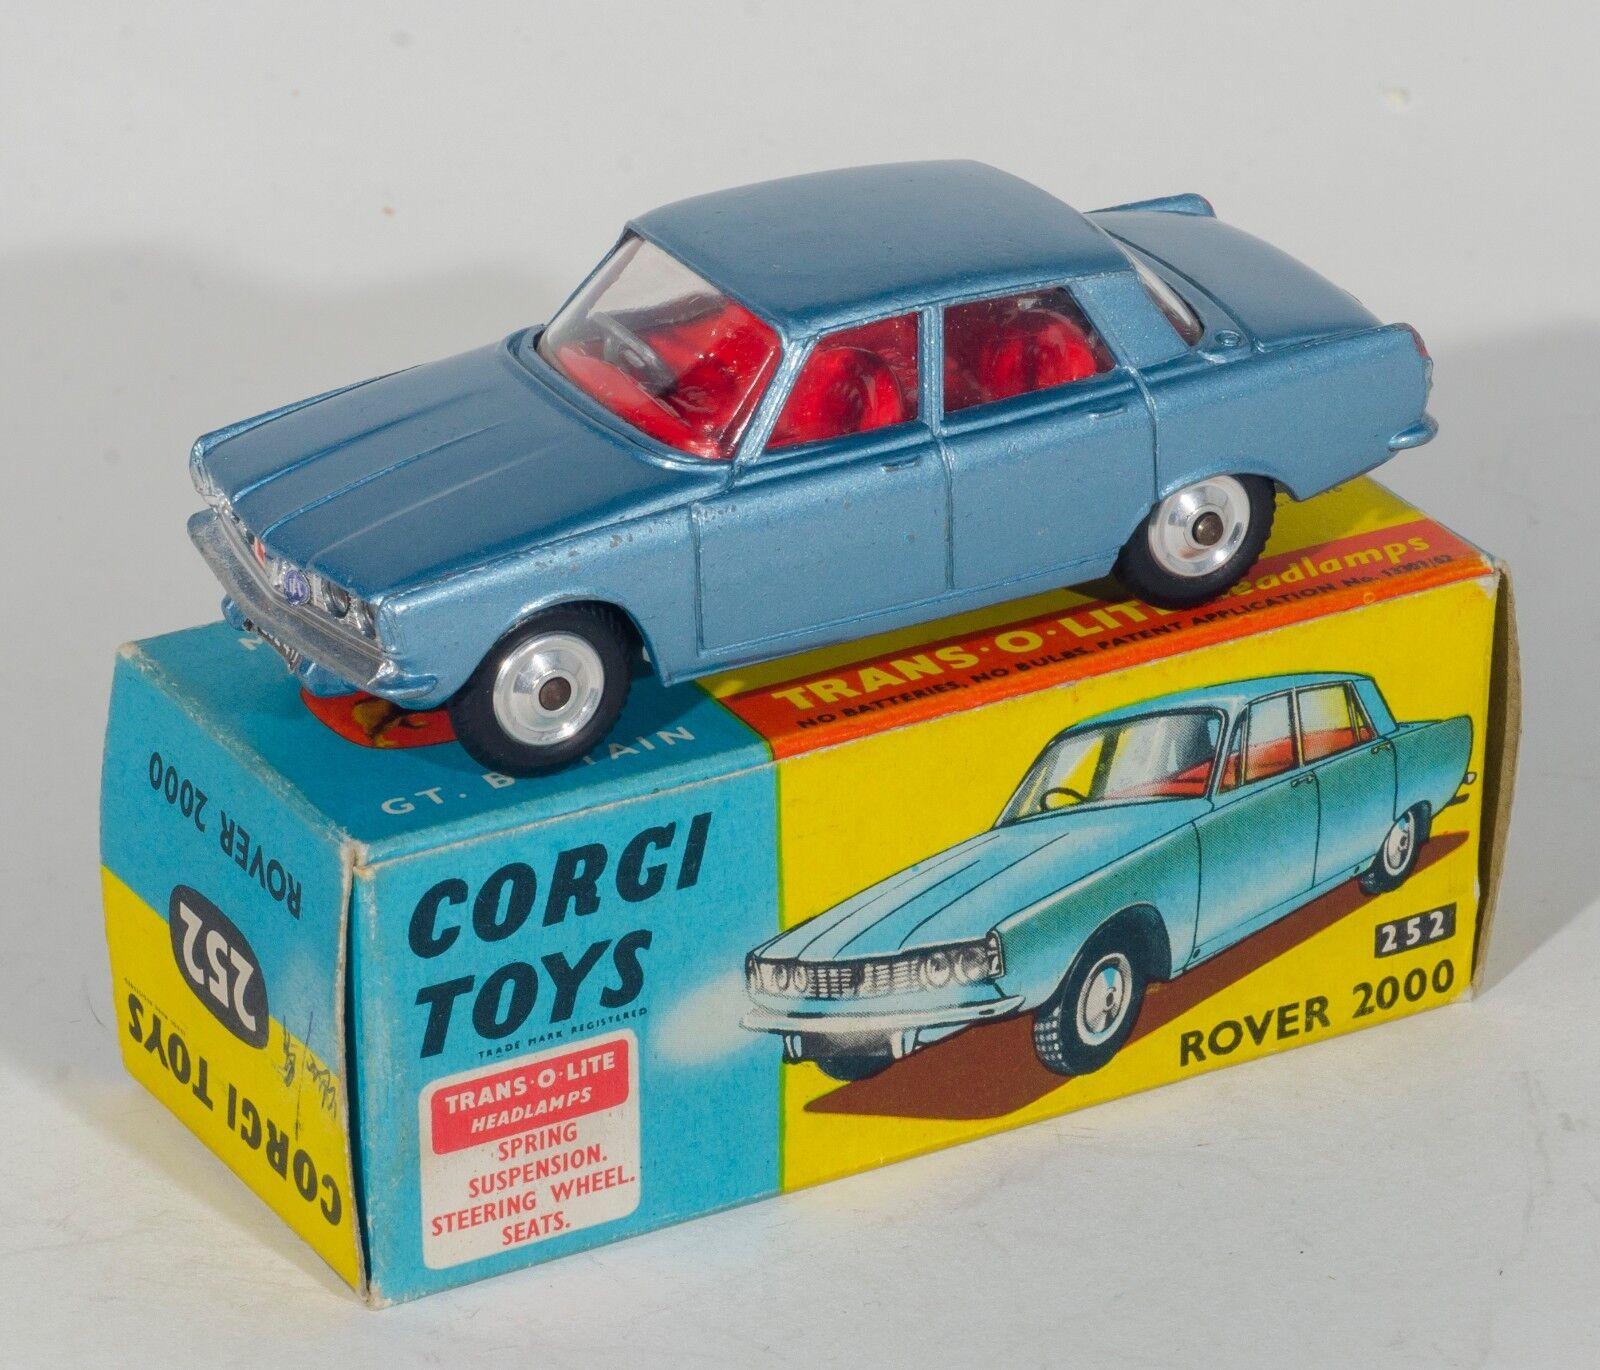 Corgi 252 Rover 2000. Metallic Steel bluee. Boxed Original 1960's